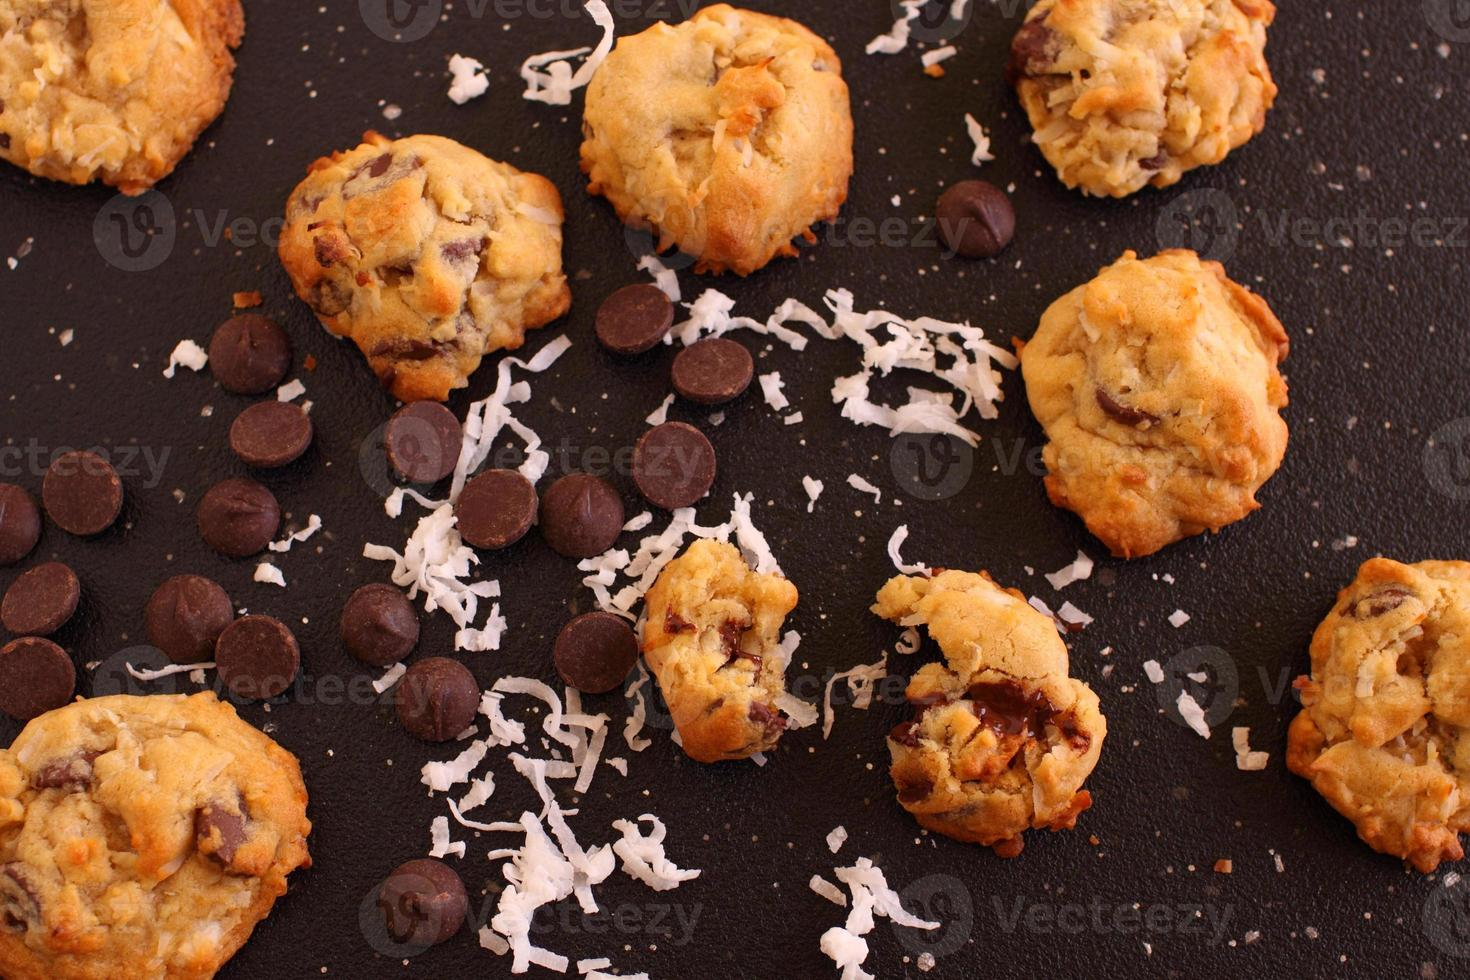 dunkle Schokoladenkekse und Kokosnusskekse foto